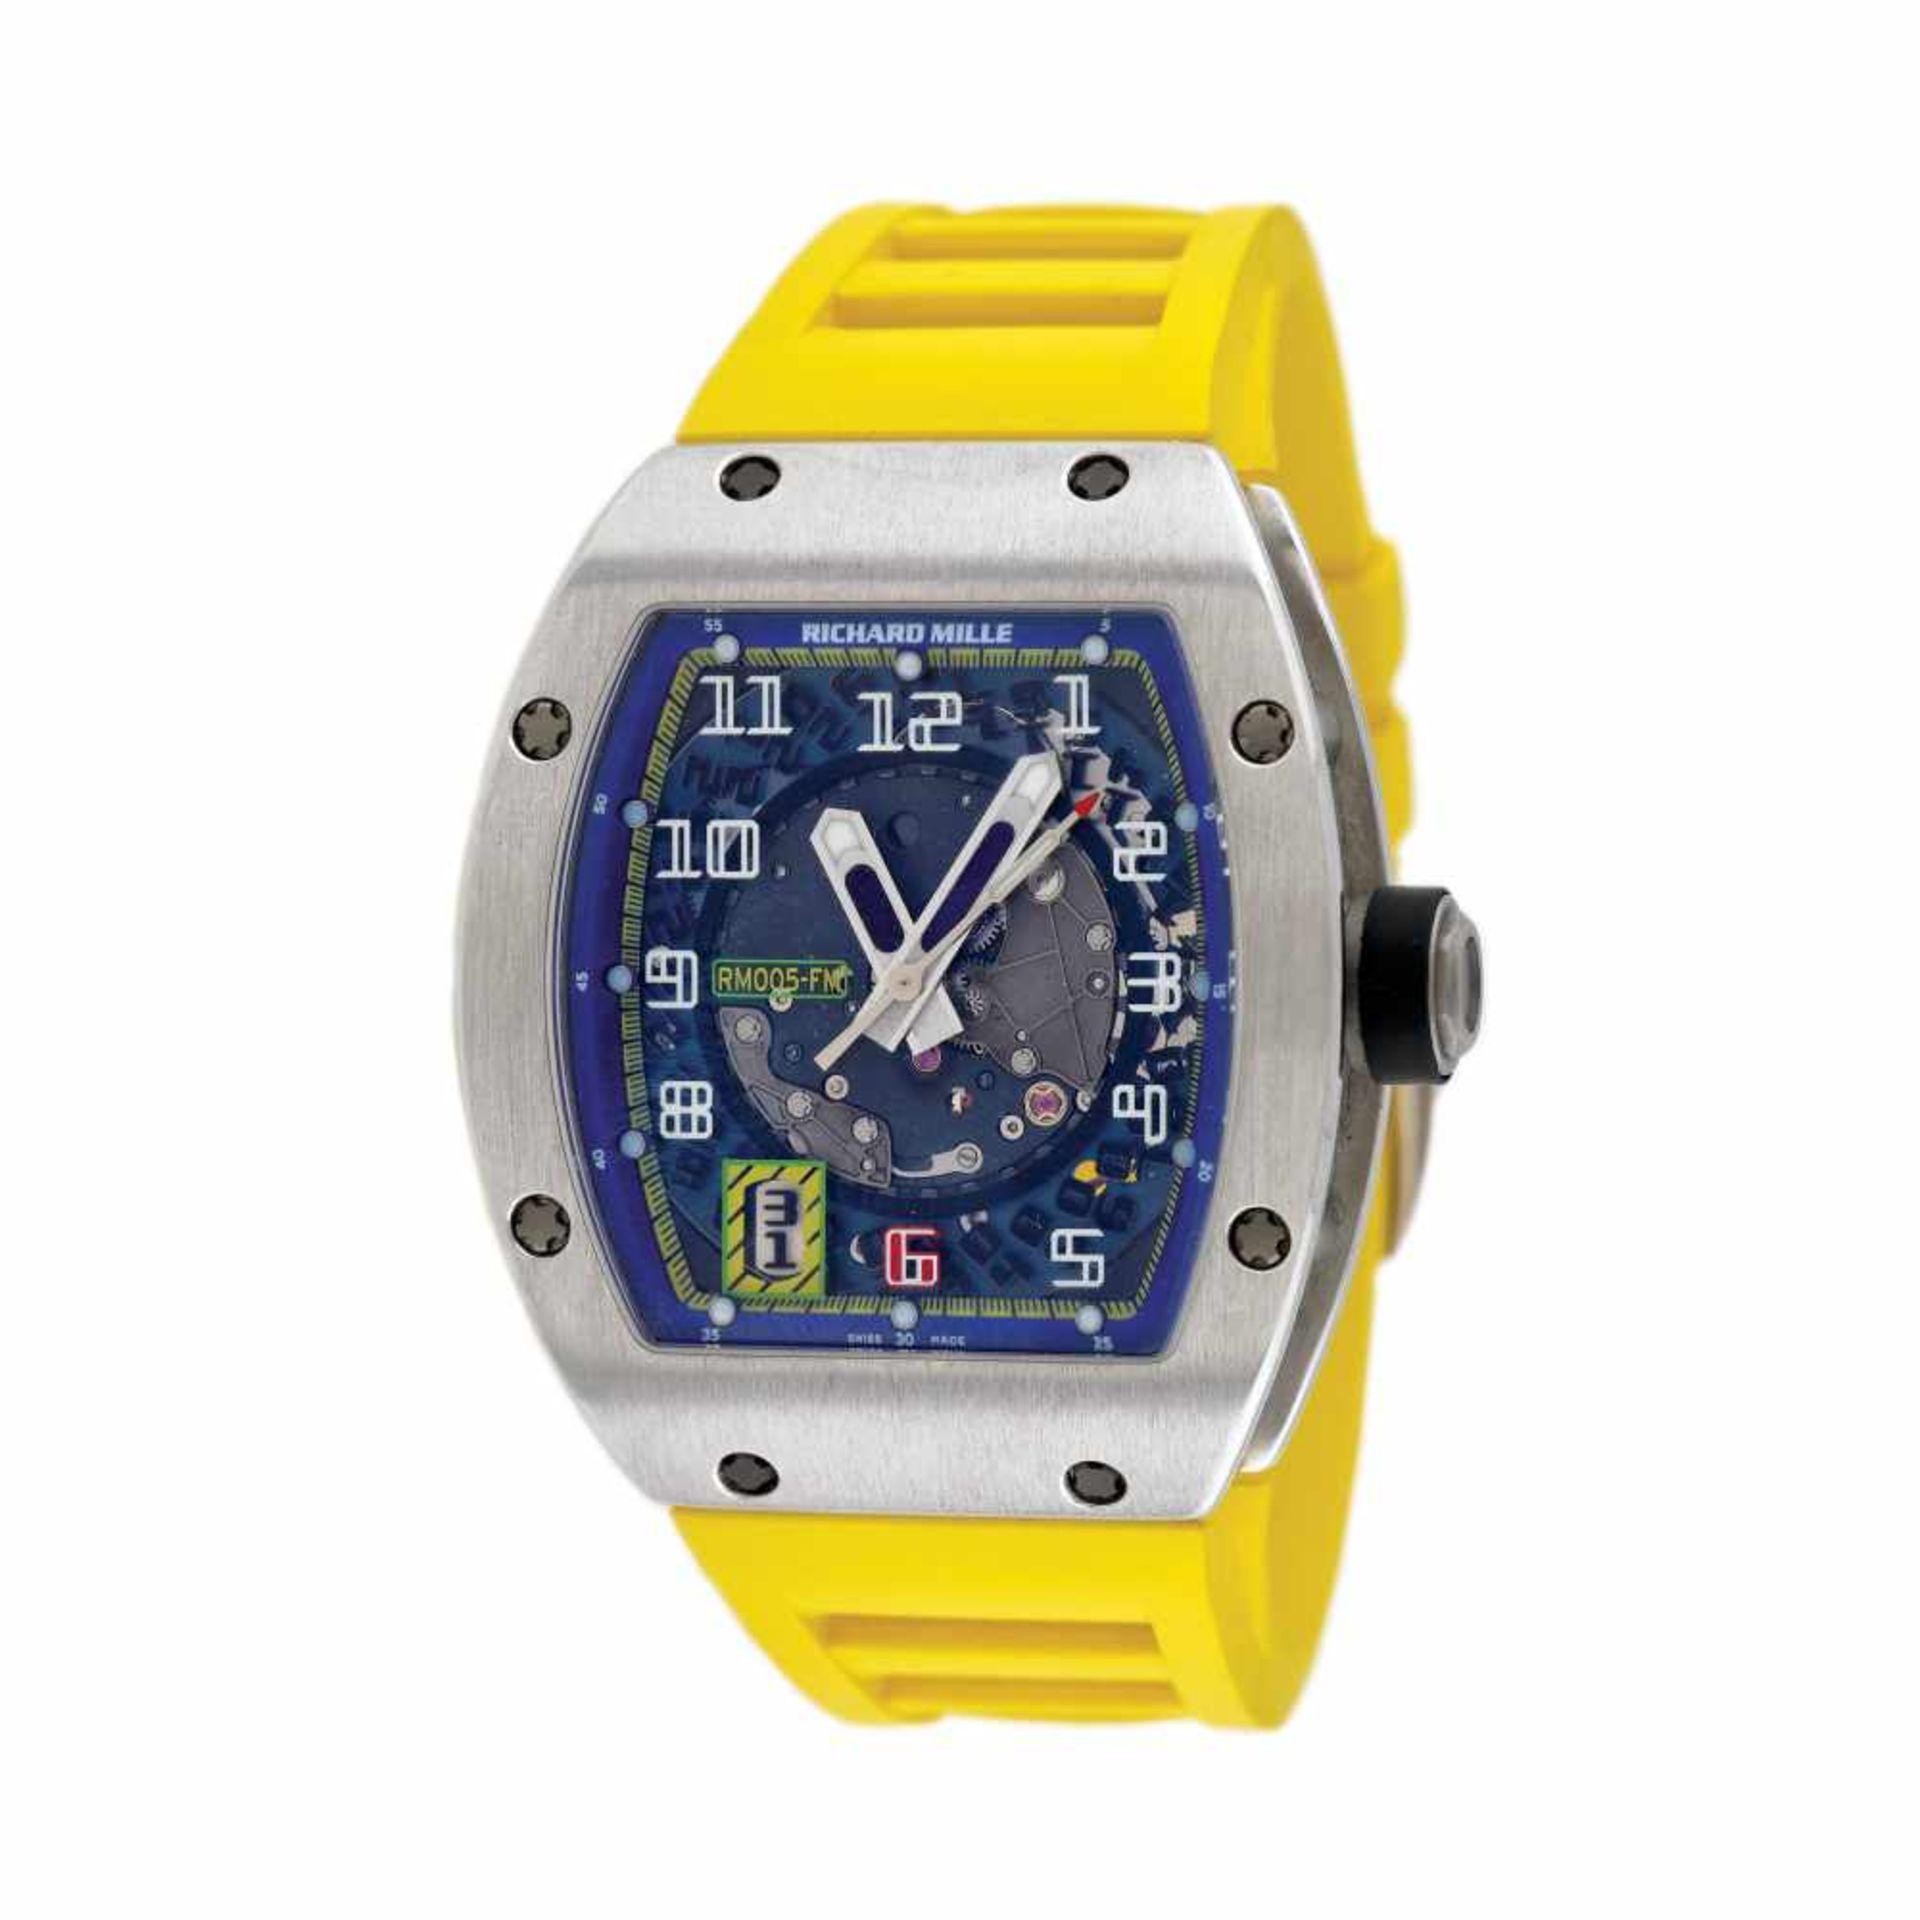 Richard Mille RM005 Felipe Massa AG TI wristwatch, platinum, men, limited edition 3/40